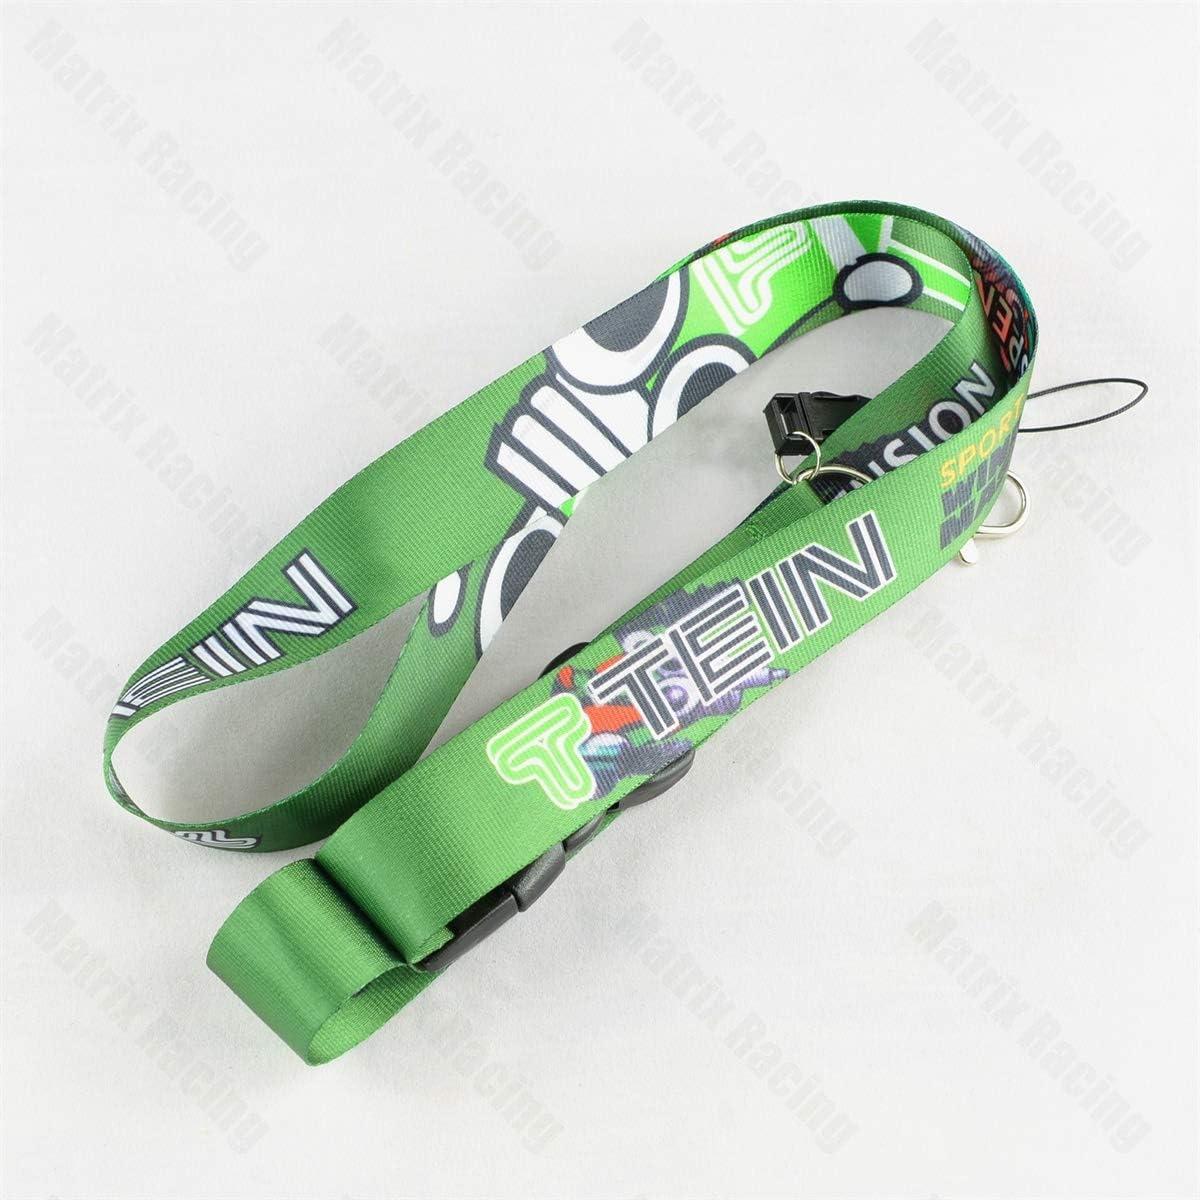 JDM Style for TEIN Cellphone Lanyard Racing Car Keychain ID Card Neck Strap for Mitsubishi Subaru Honda Toyota